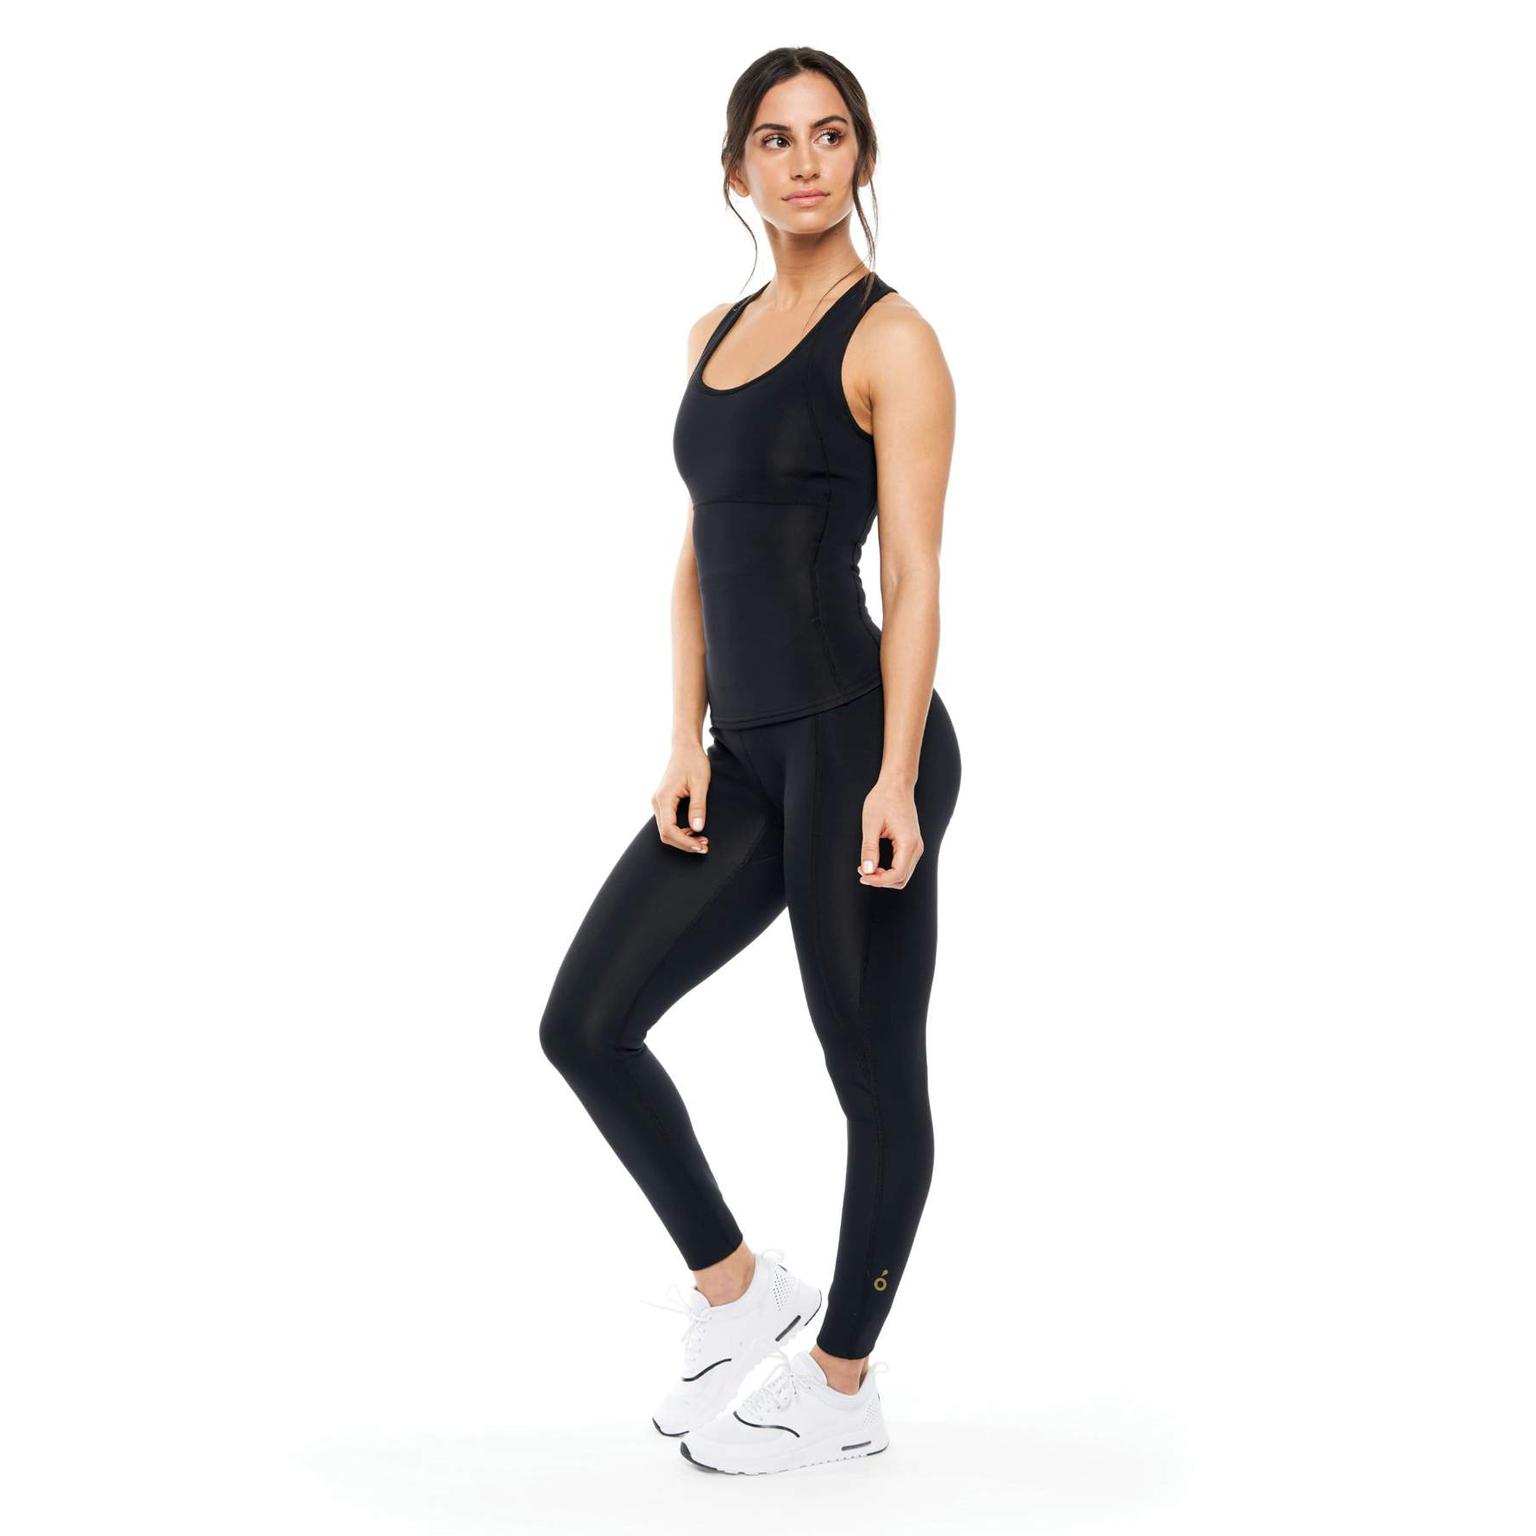 Toronto-Fitness-Model-Agency-Lifestyle-Commercial-Fitness-Model-Elizabeth-Ruffolo